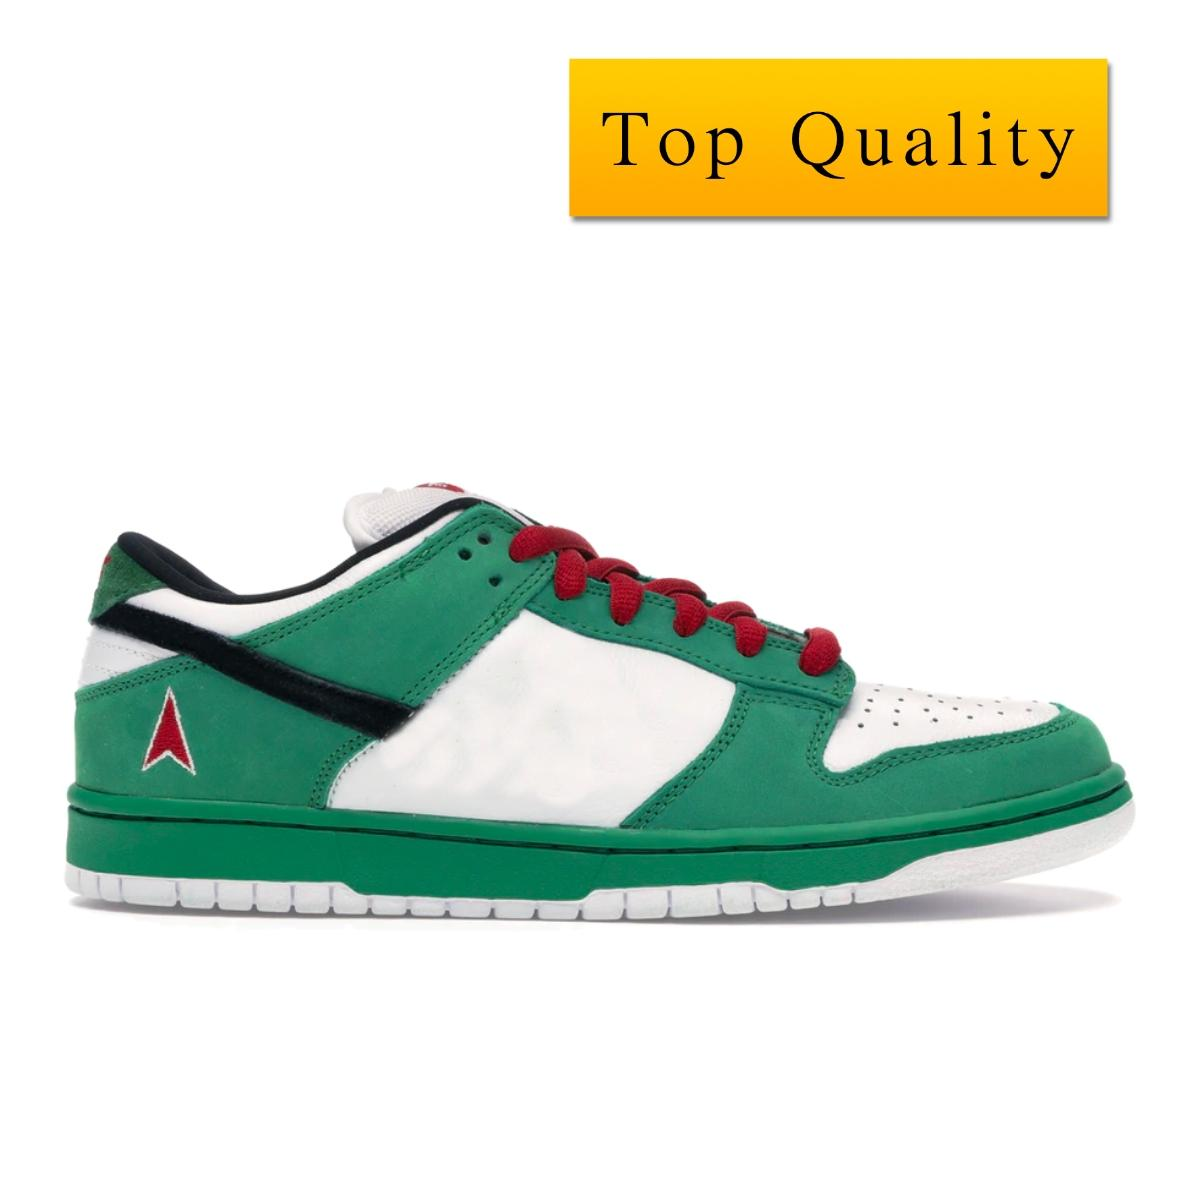 Dunk SB Low Heineken Sneakers Sport Shoes 2020 أزياء جديد منخفض Sbdnkl-Heiny رجل عارضة أحذية colorway لCLASSIC أخضر أبيض أسود RED مع صندوق حجم 36-46